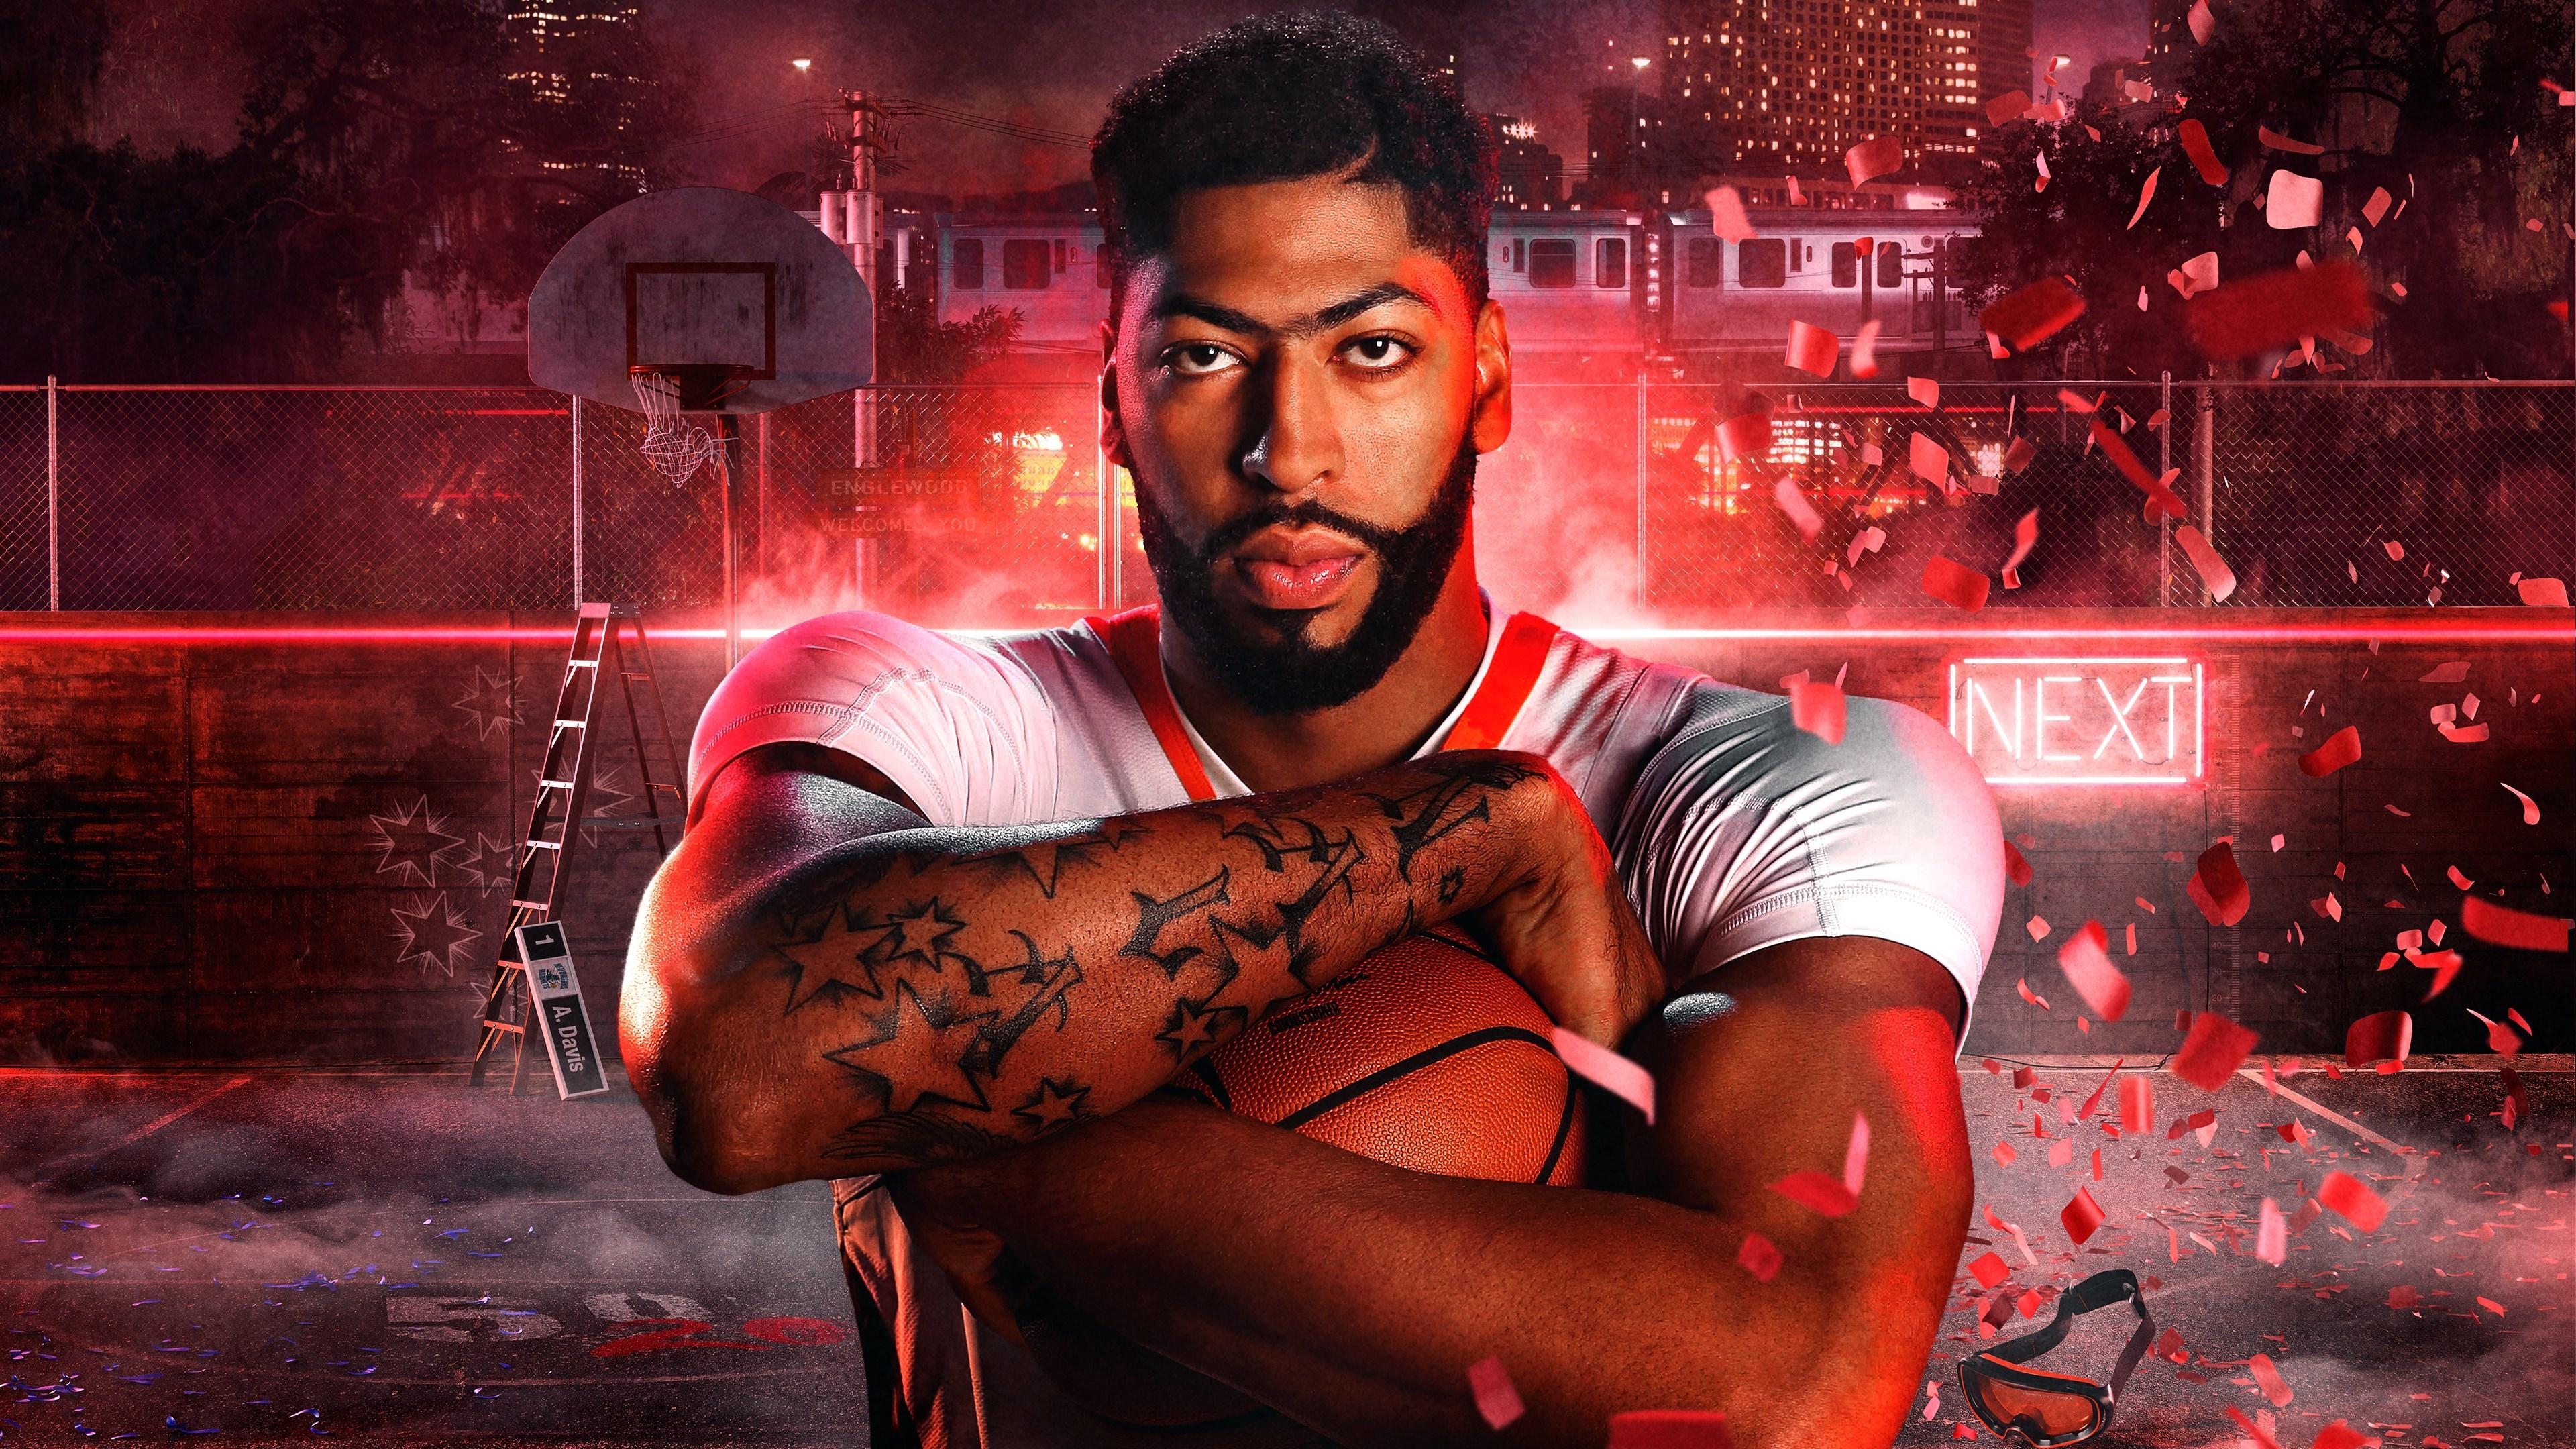 NBA 2K20 Wallpaper, HD Games 4K Wallpapers, Images, Photos ...